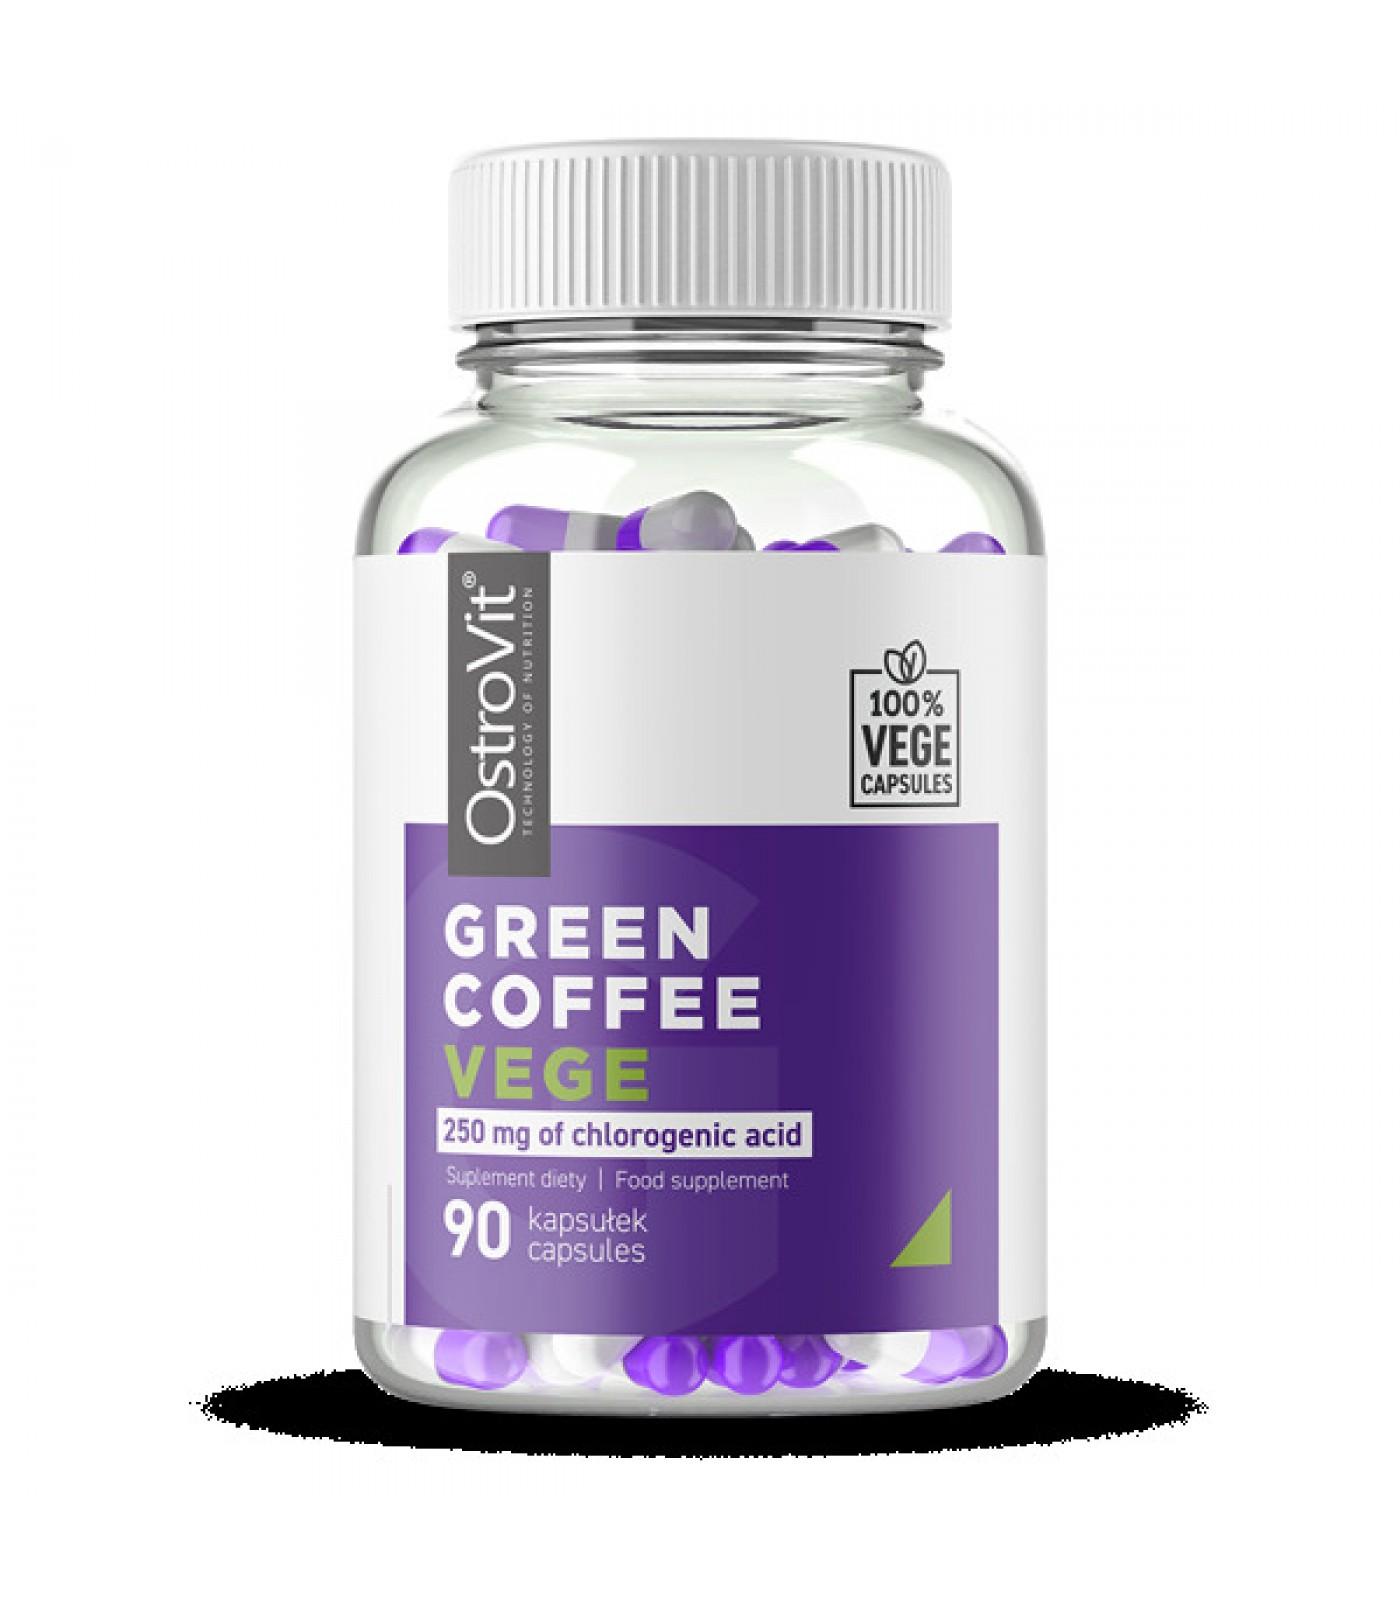 OstroVit - Green Coffee 500 mg / Vege - 90caps